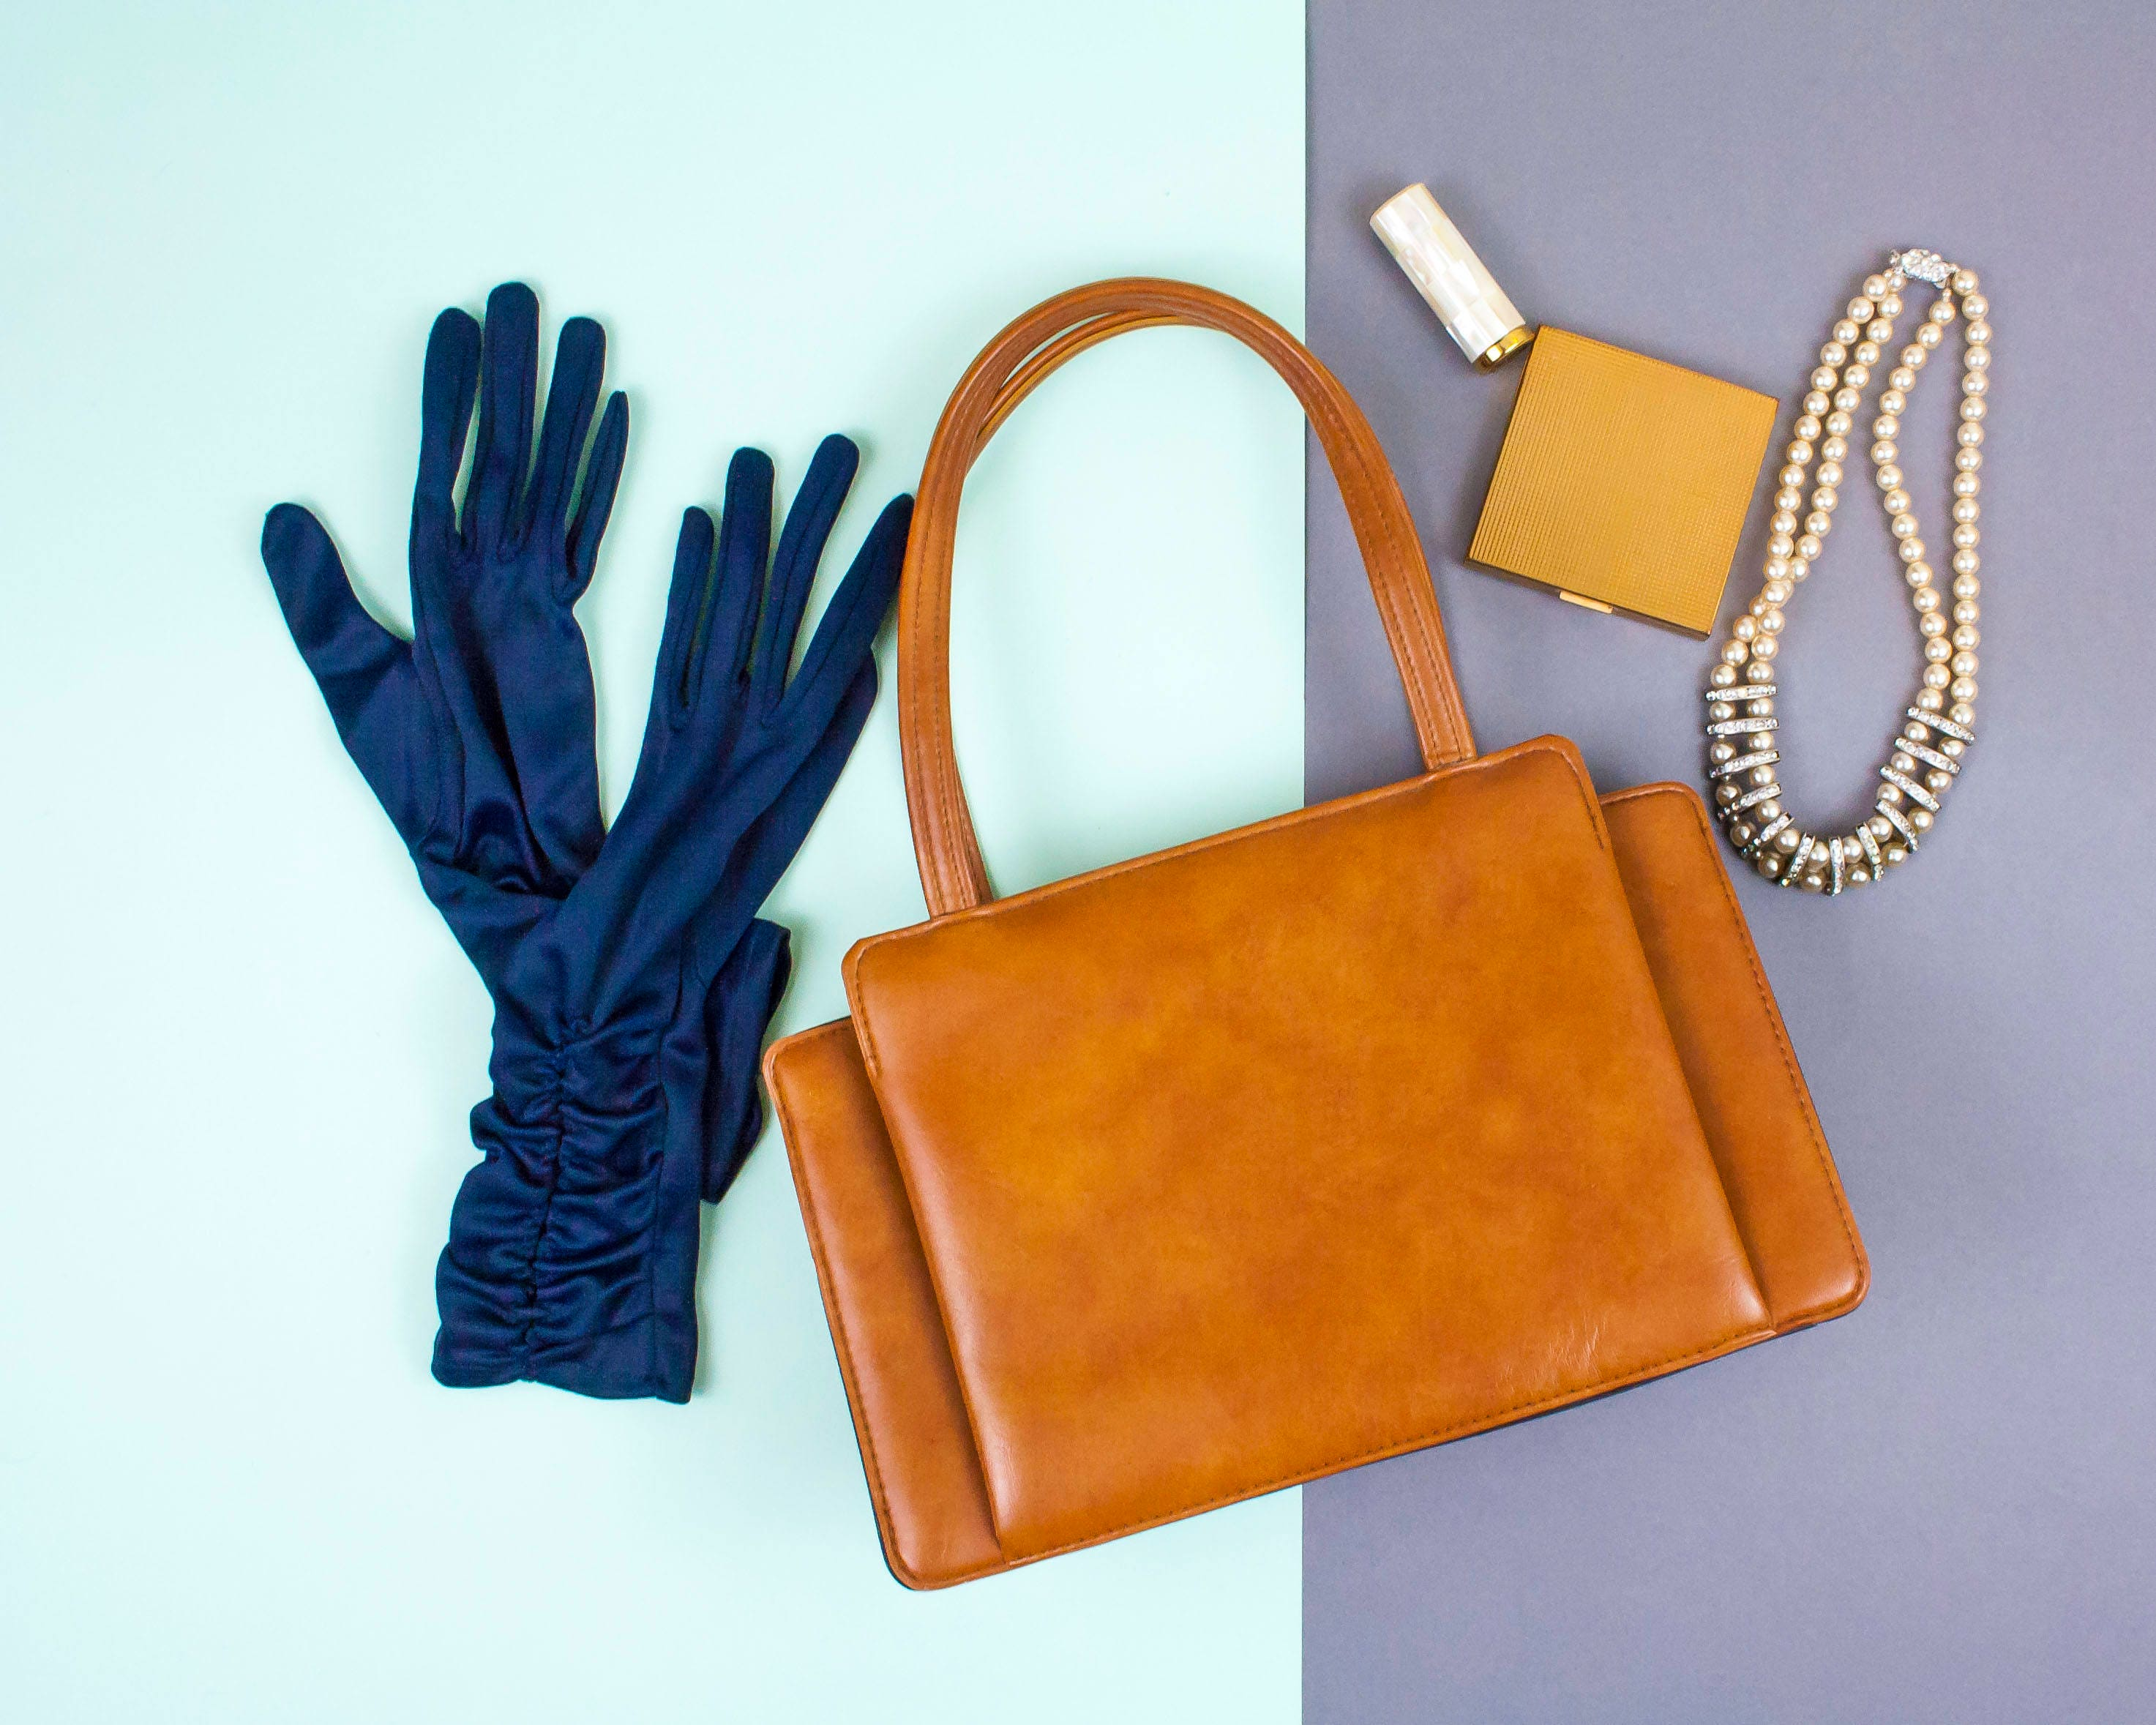 Vintage Tan Bag 60s Handbag Retro Handbag Purse Pin Up Bag Art Deco Style Tan Handbag Faux Leather Vegetarian Top Handle Bag 1960s